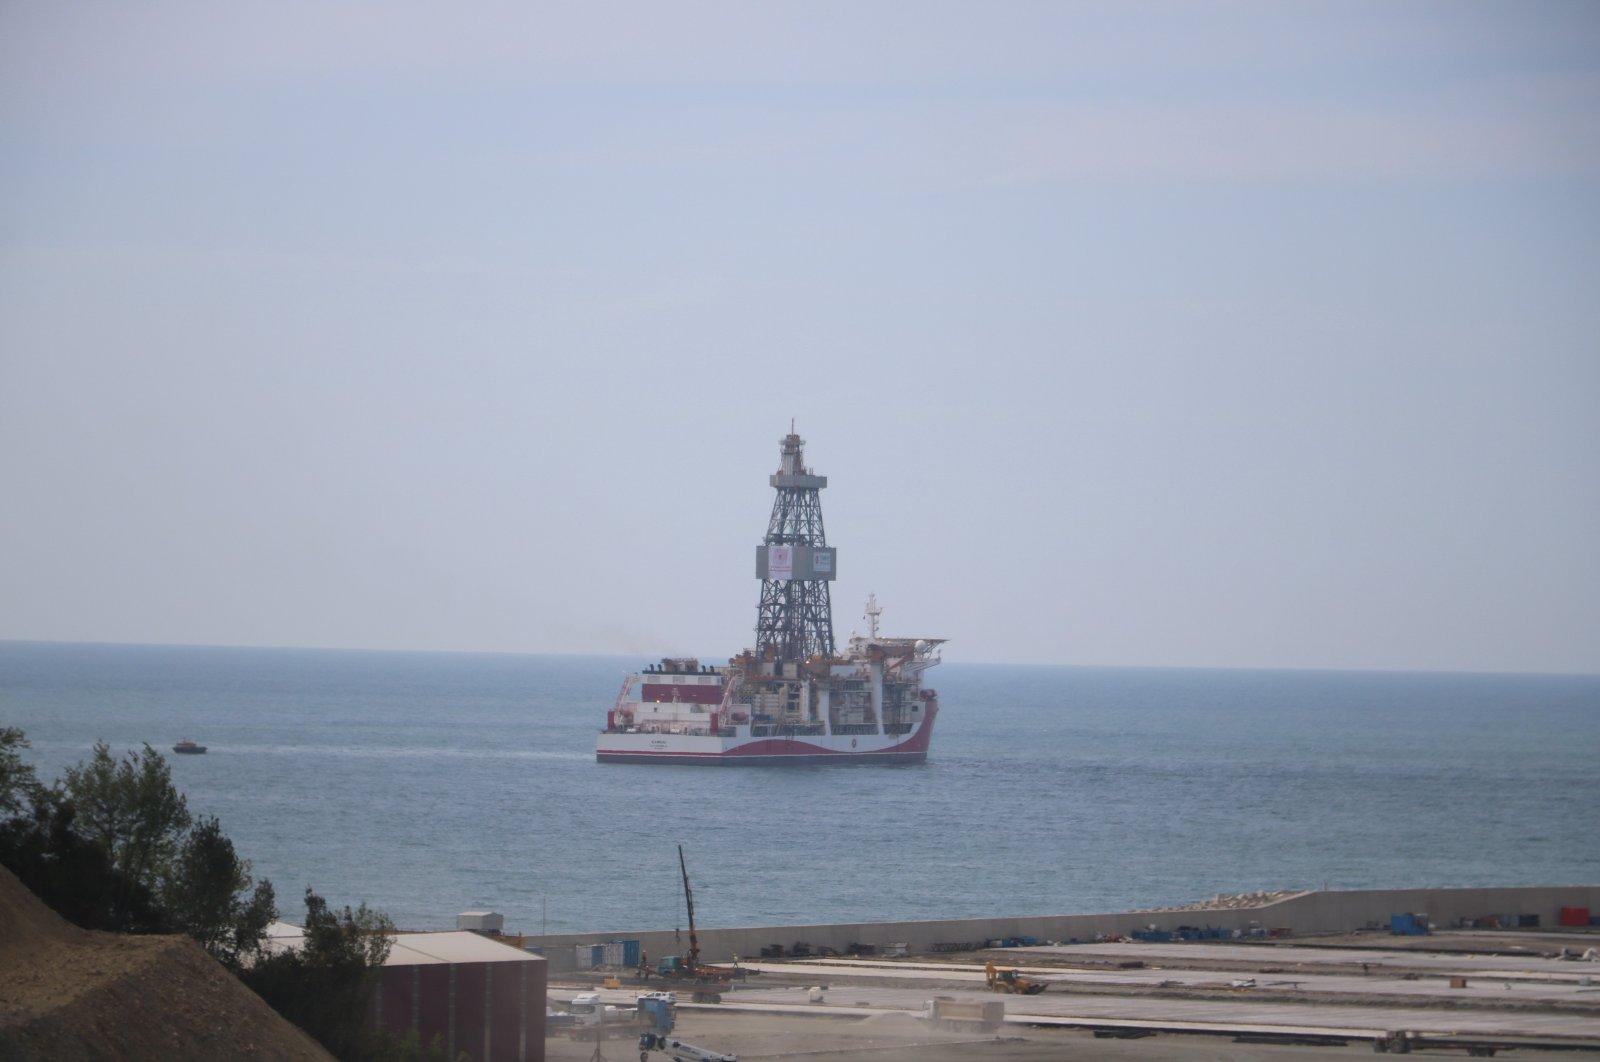 The Kanuni drillship is seen off the Port of Filyos in northern Zonguldak province, Turkey, May 4, 2021. (IHA Photo)